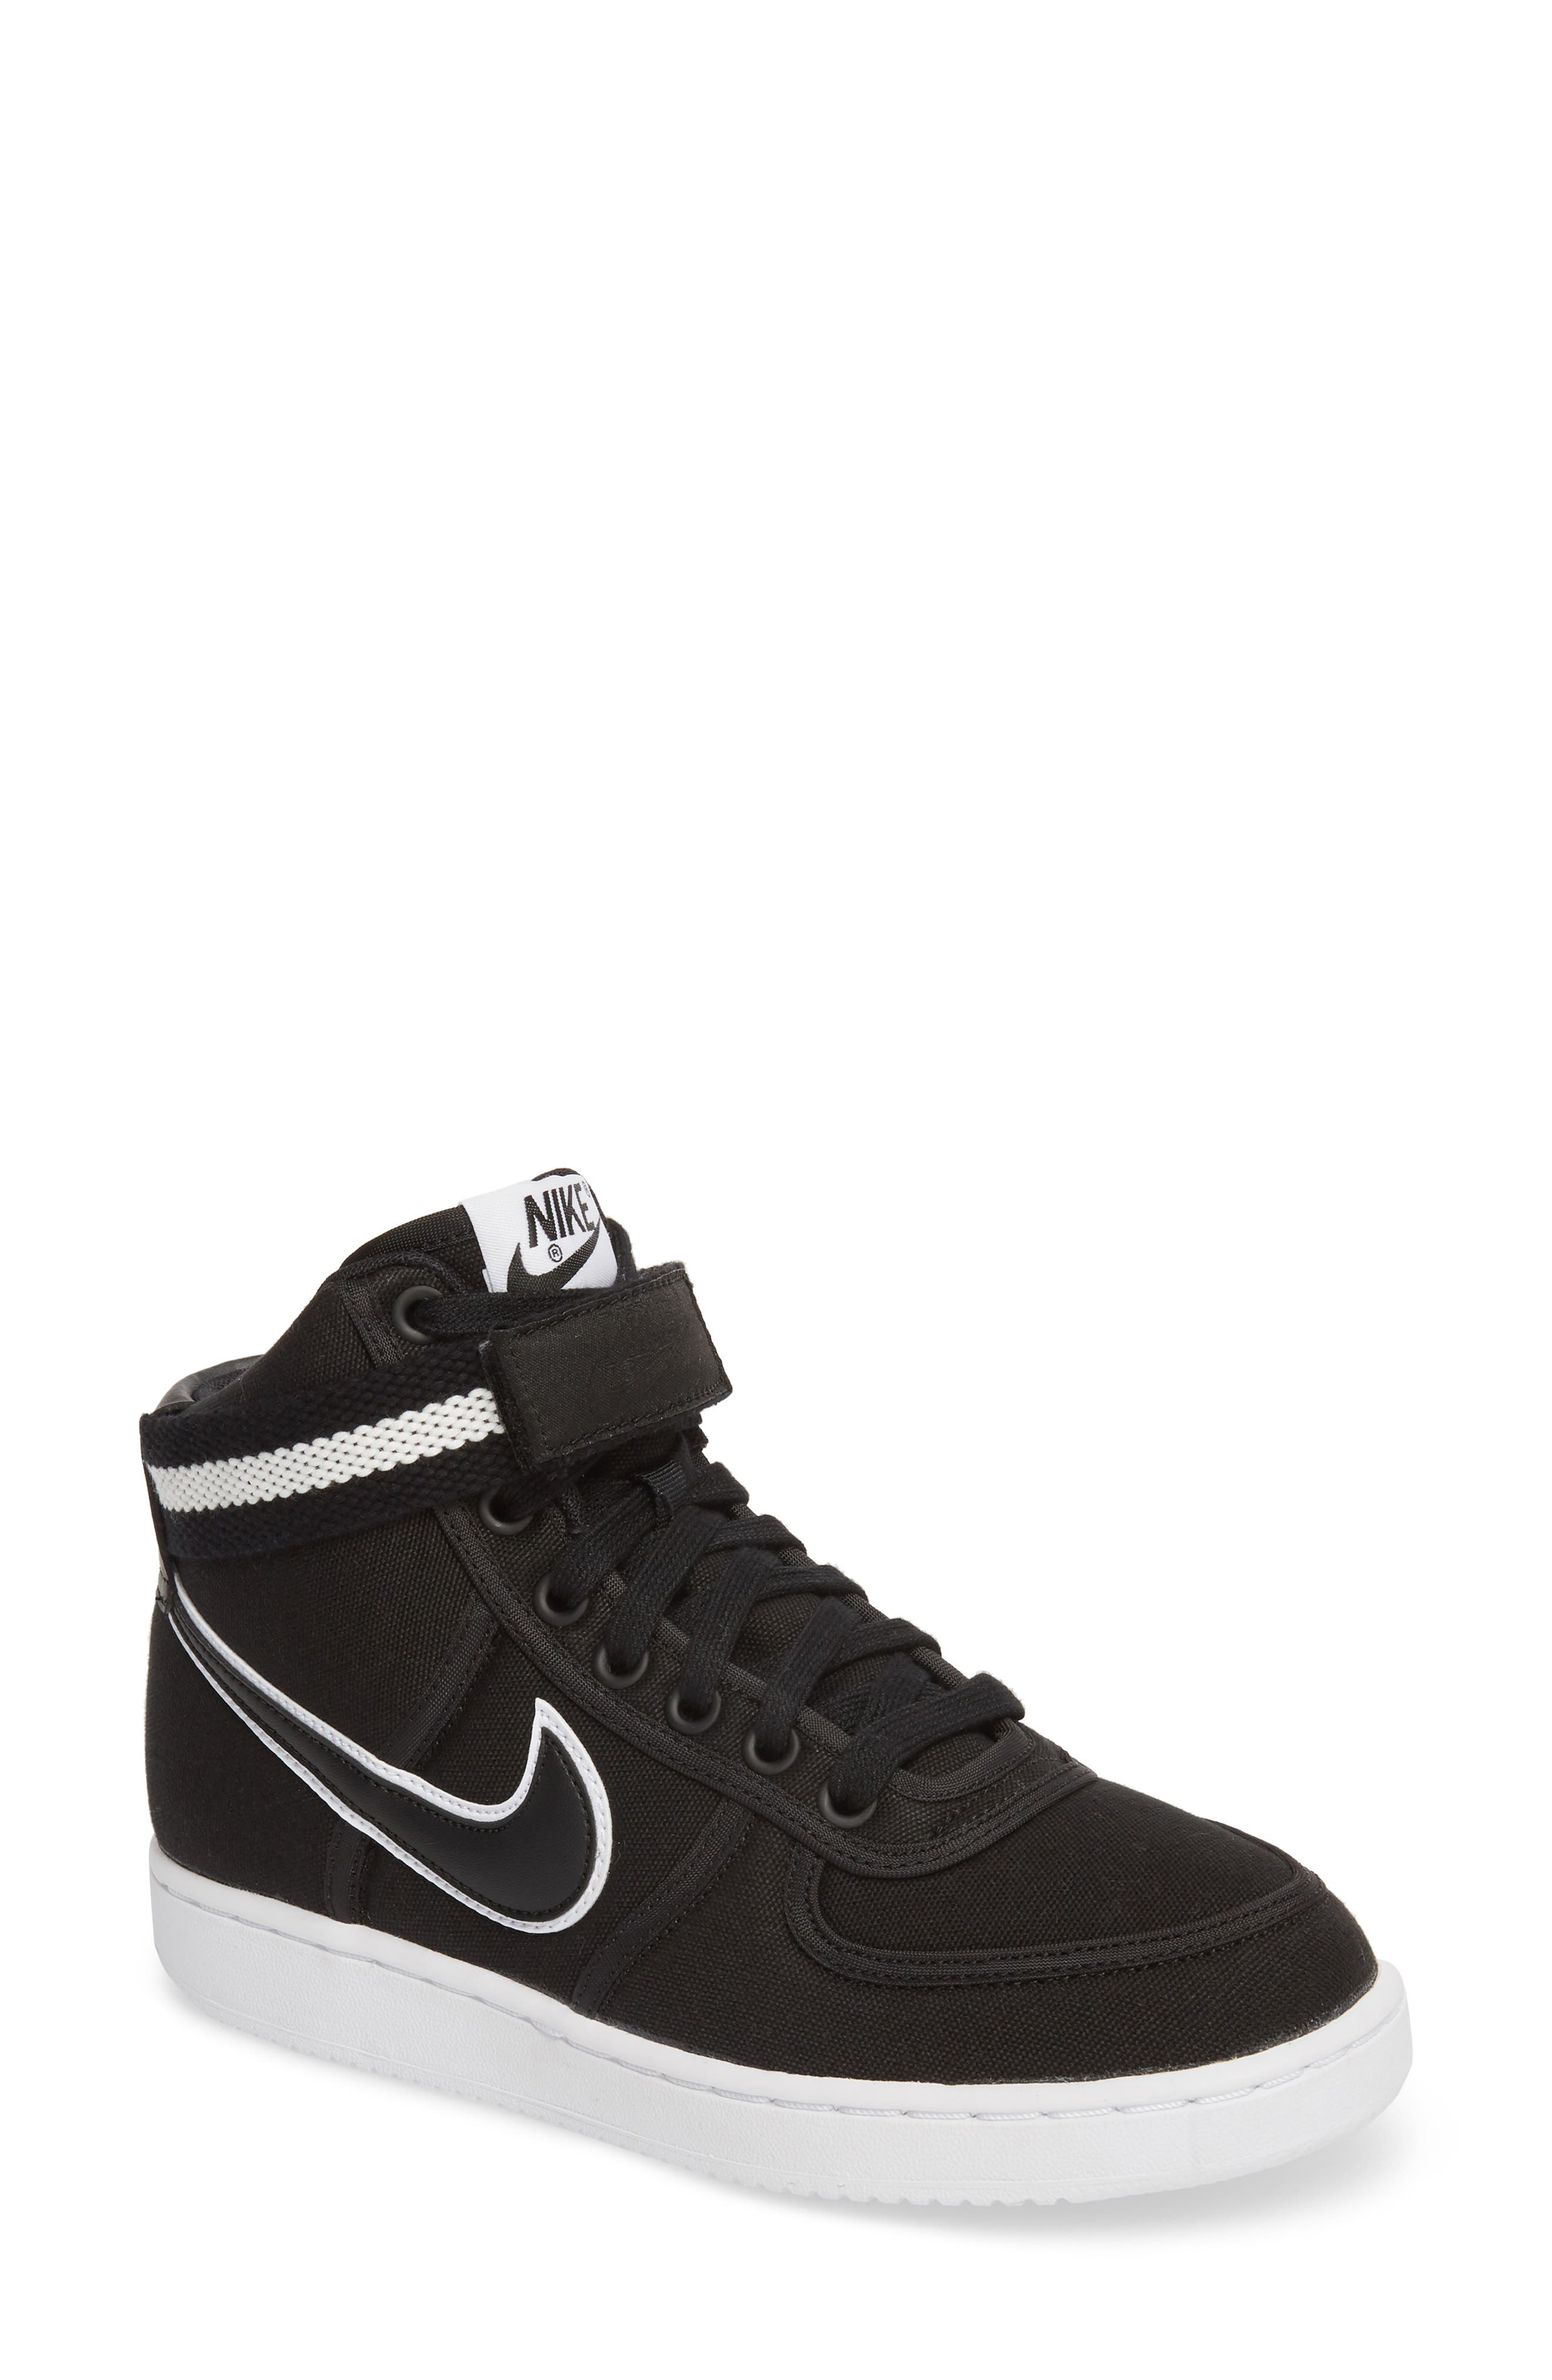 Vandal High Top Sneaker,                             Main thumbnail 1, color,                             BLACK/ BLACK-WHITE